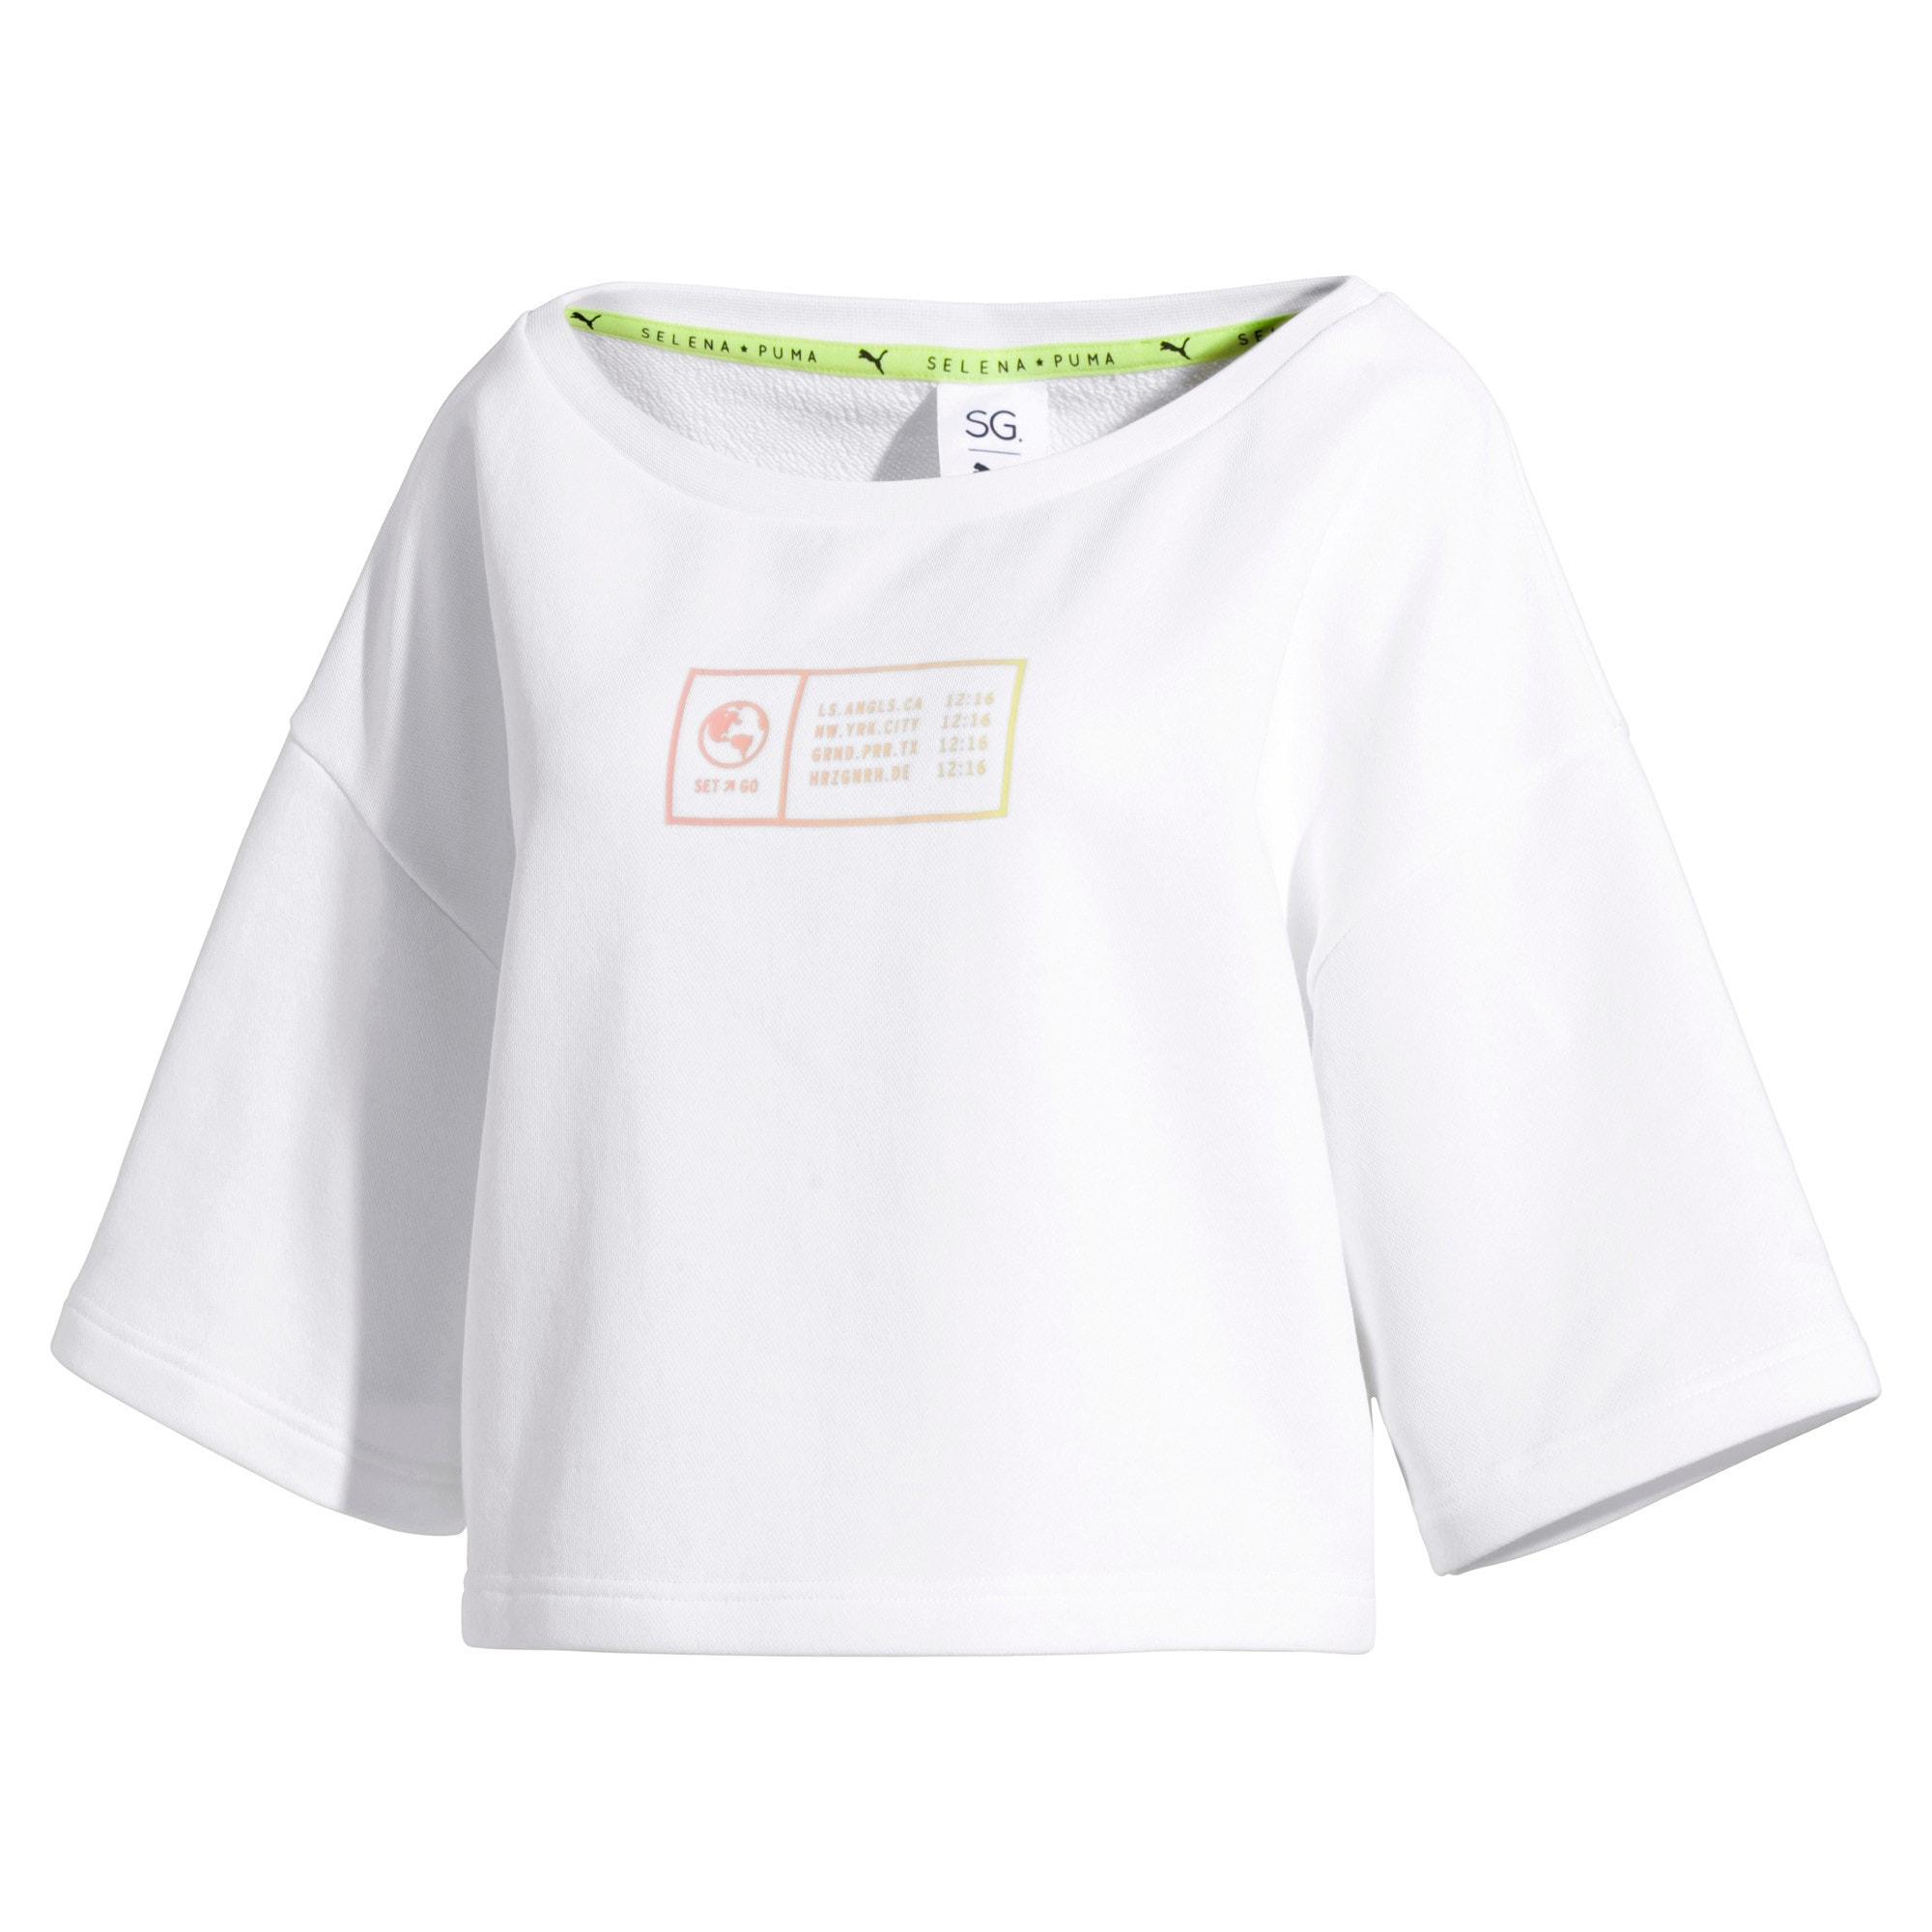 Thumbnail 4 of PUMA x SELENA GOMEZ Cropped Short Sleeve Women's Sweater, Puma White, medium